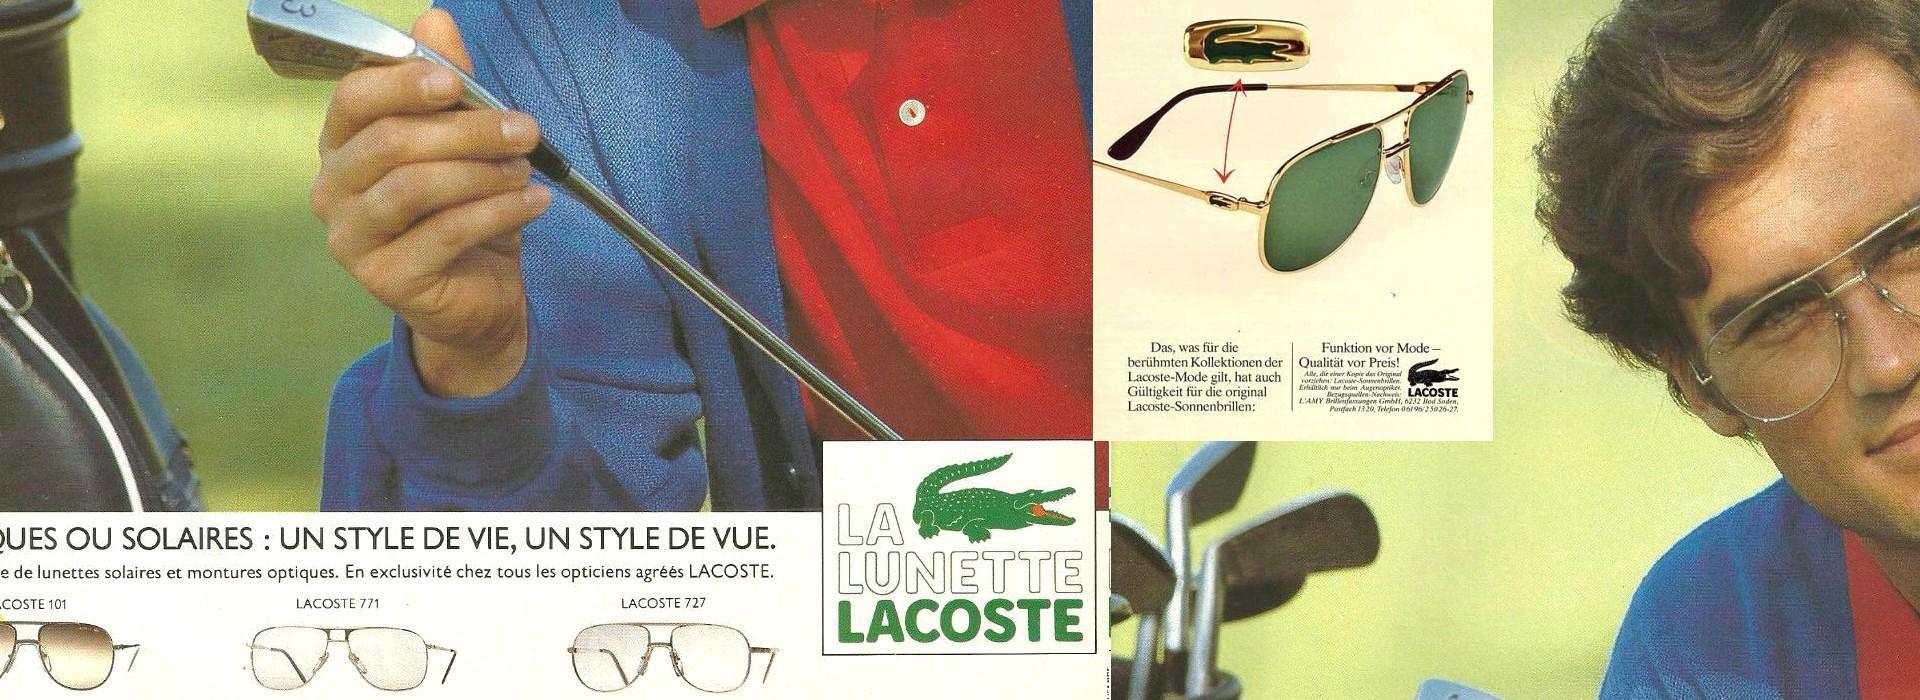 Lacoste designer vintage sunglasses